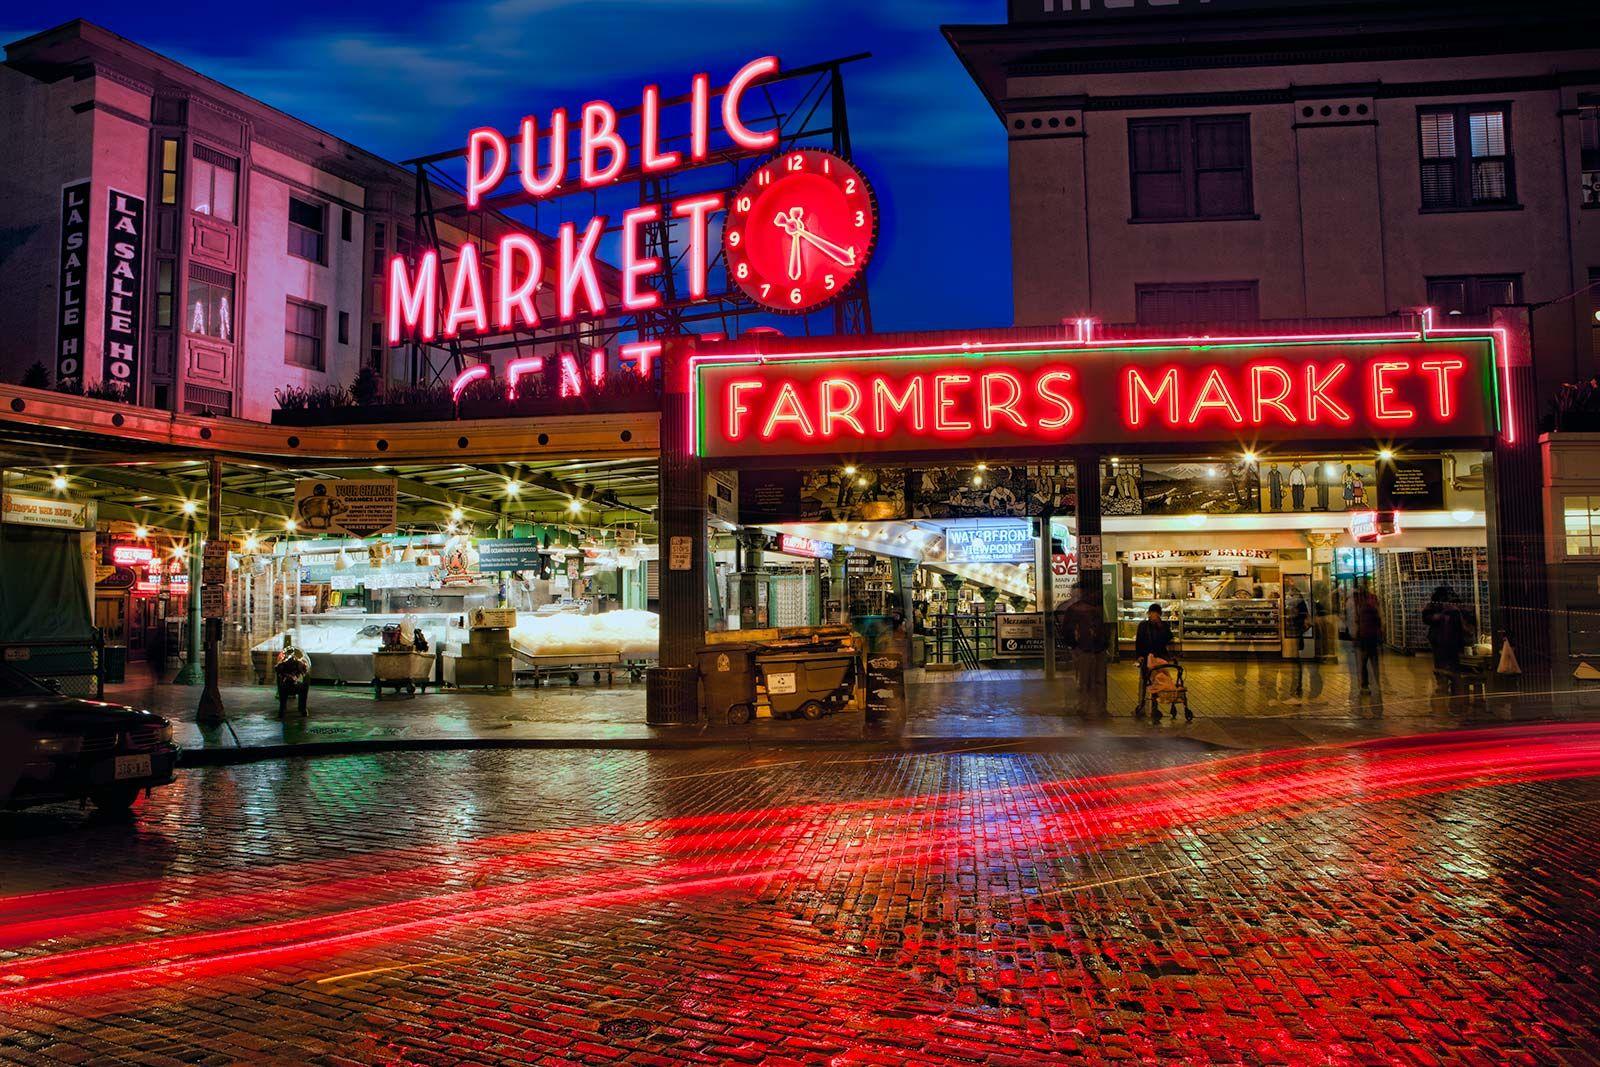 market seattle Seattleu0027s Public Market Center